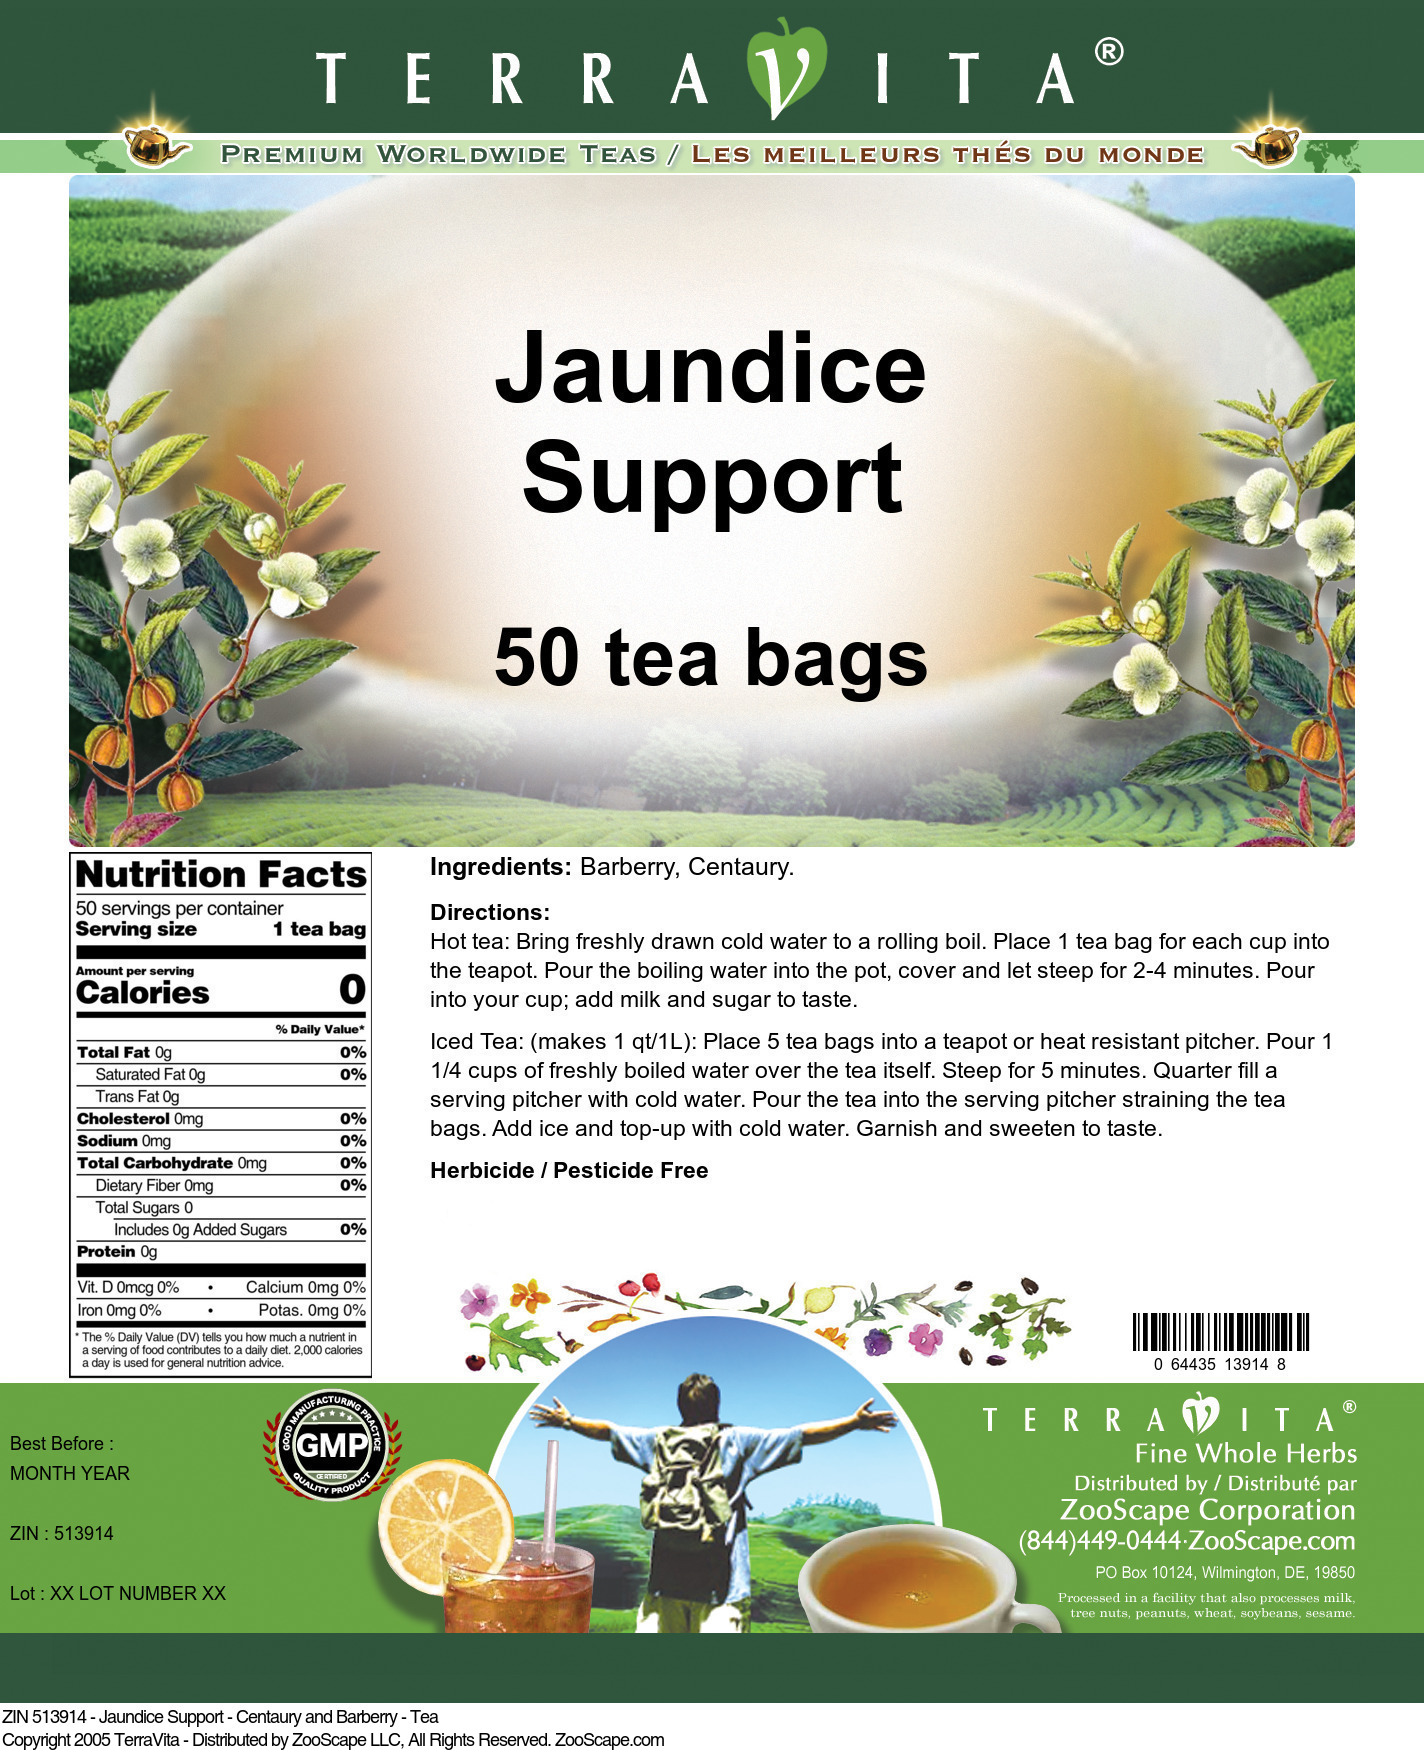 Jaundice Support - Centaury and Barberry - Tea